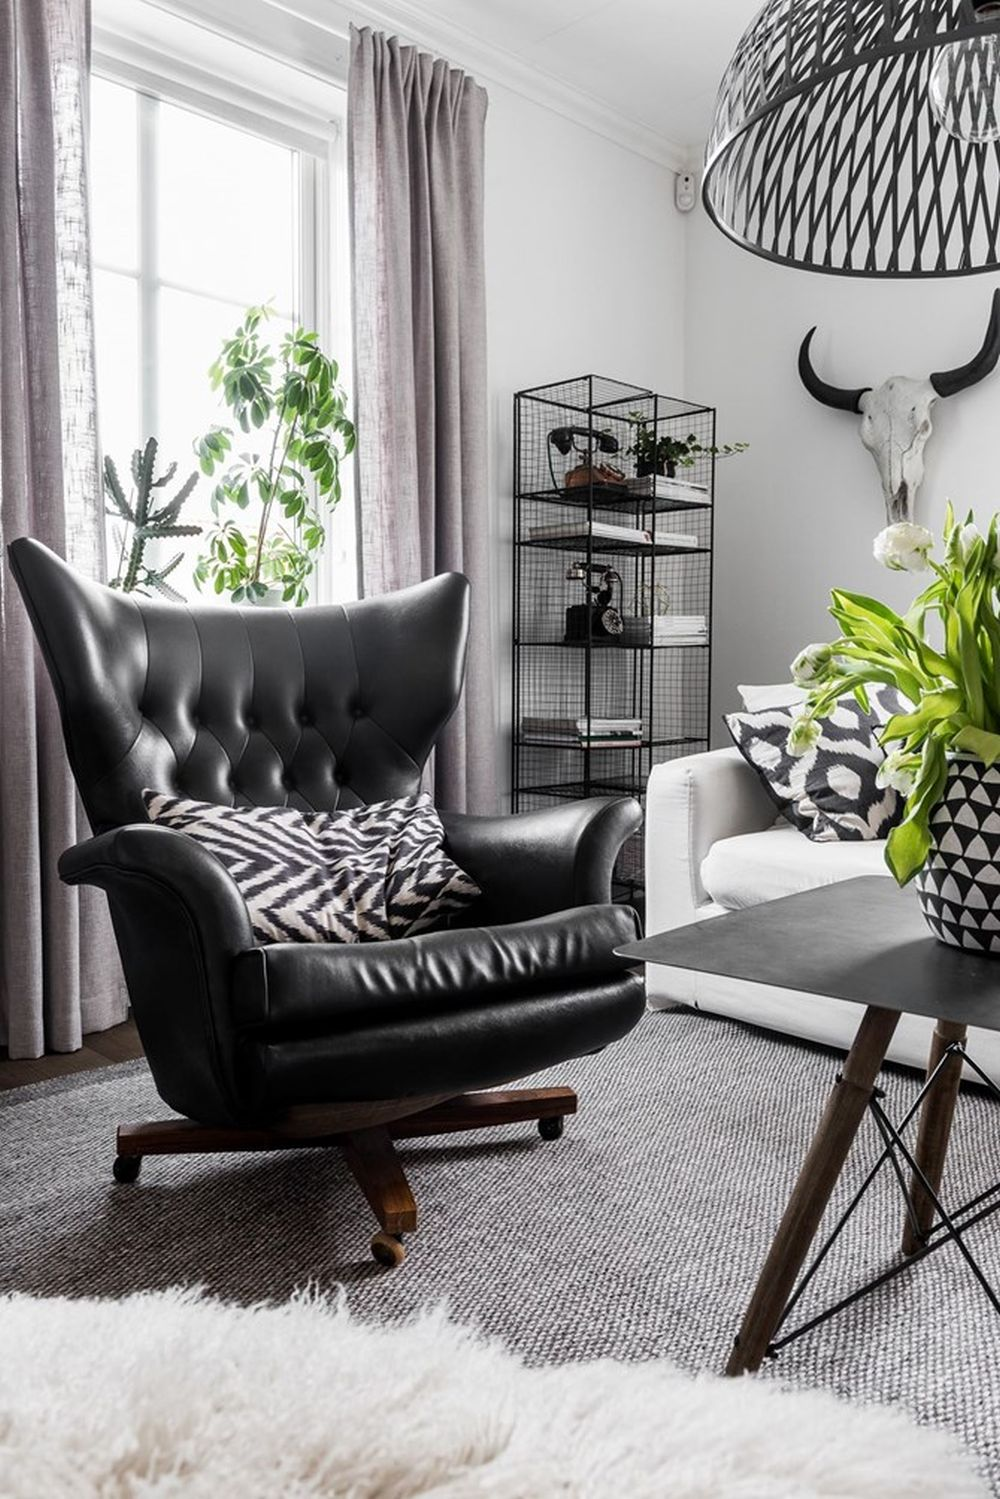 adelaparvu.com despre casa in stil scandinav, Foto Lundin, Christian Johansson (10)